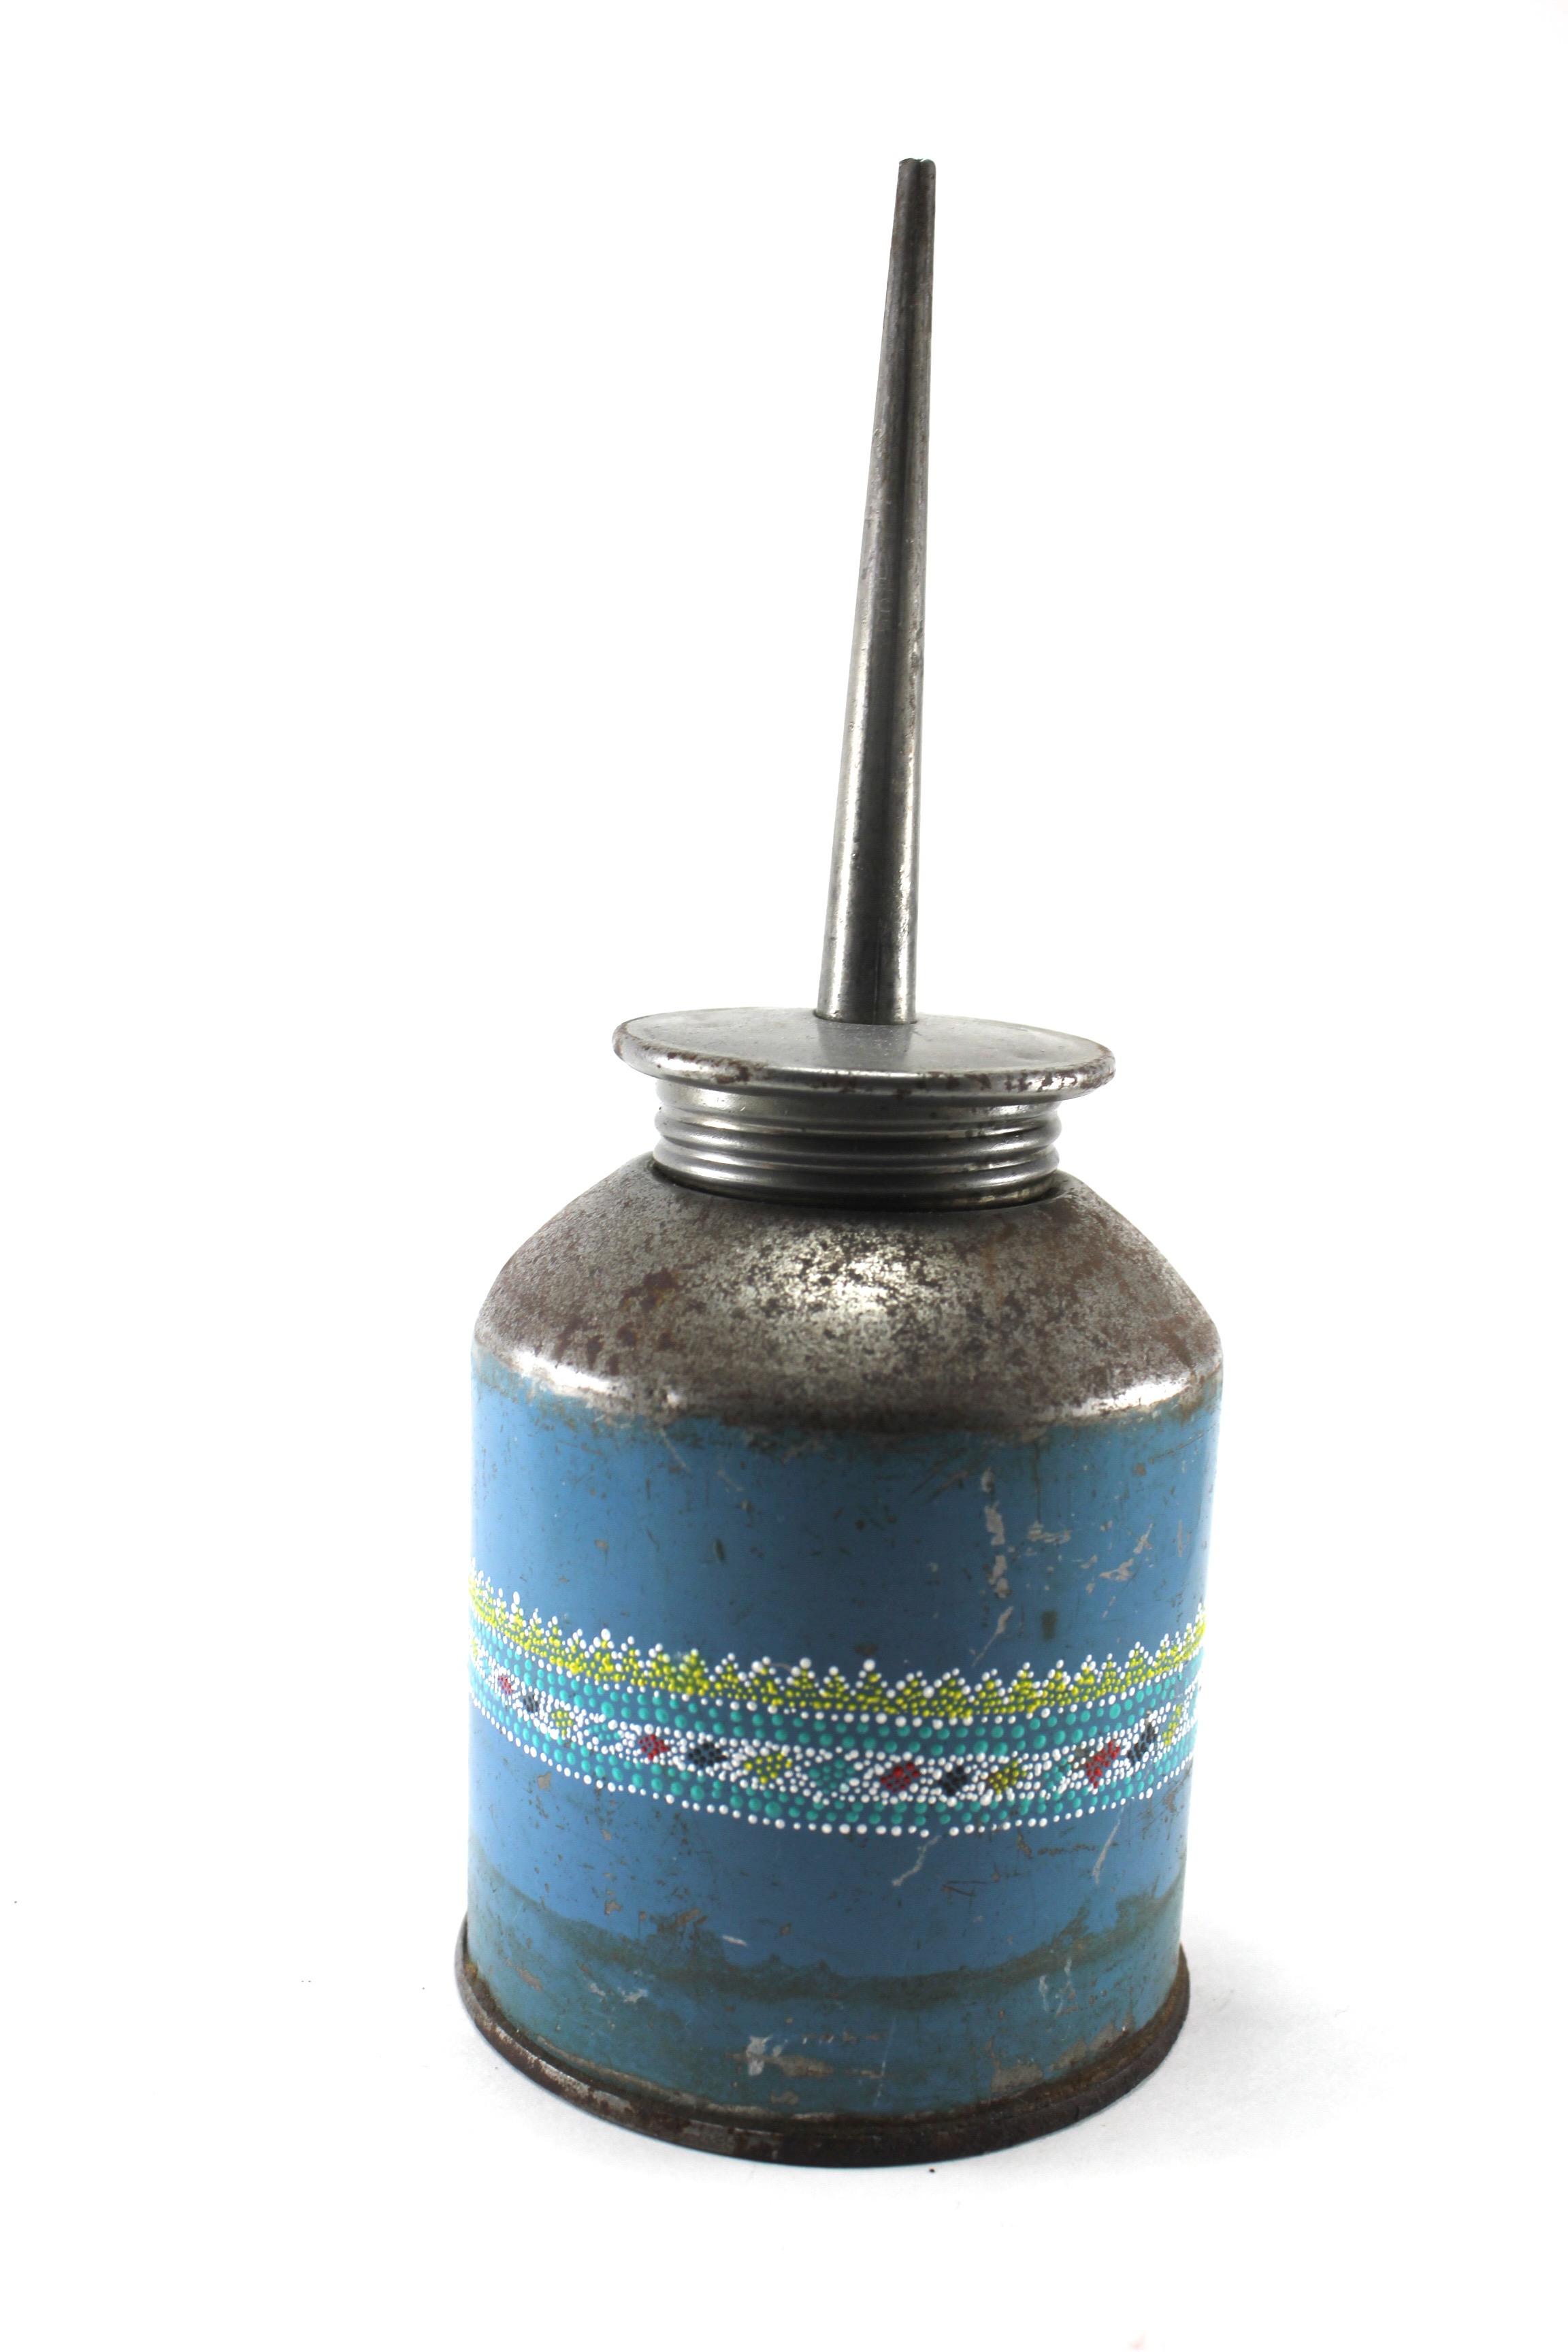 oil can_2012.jpg